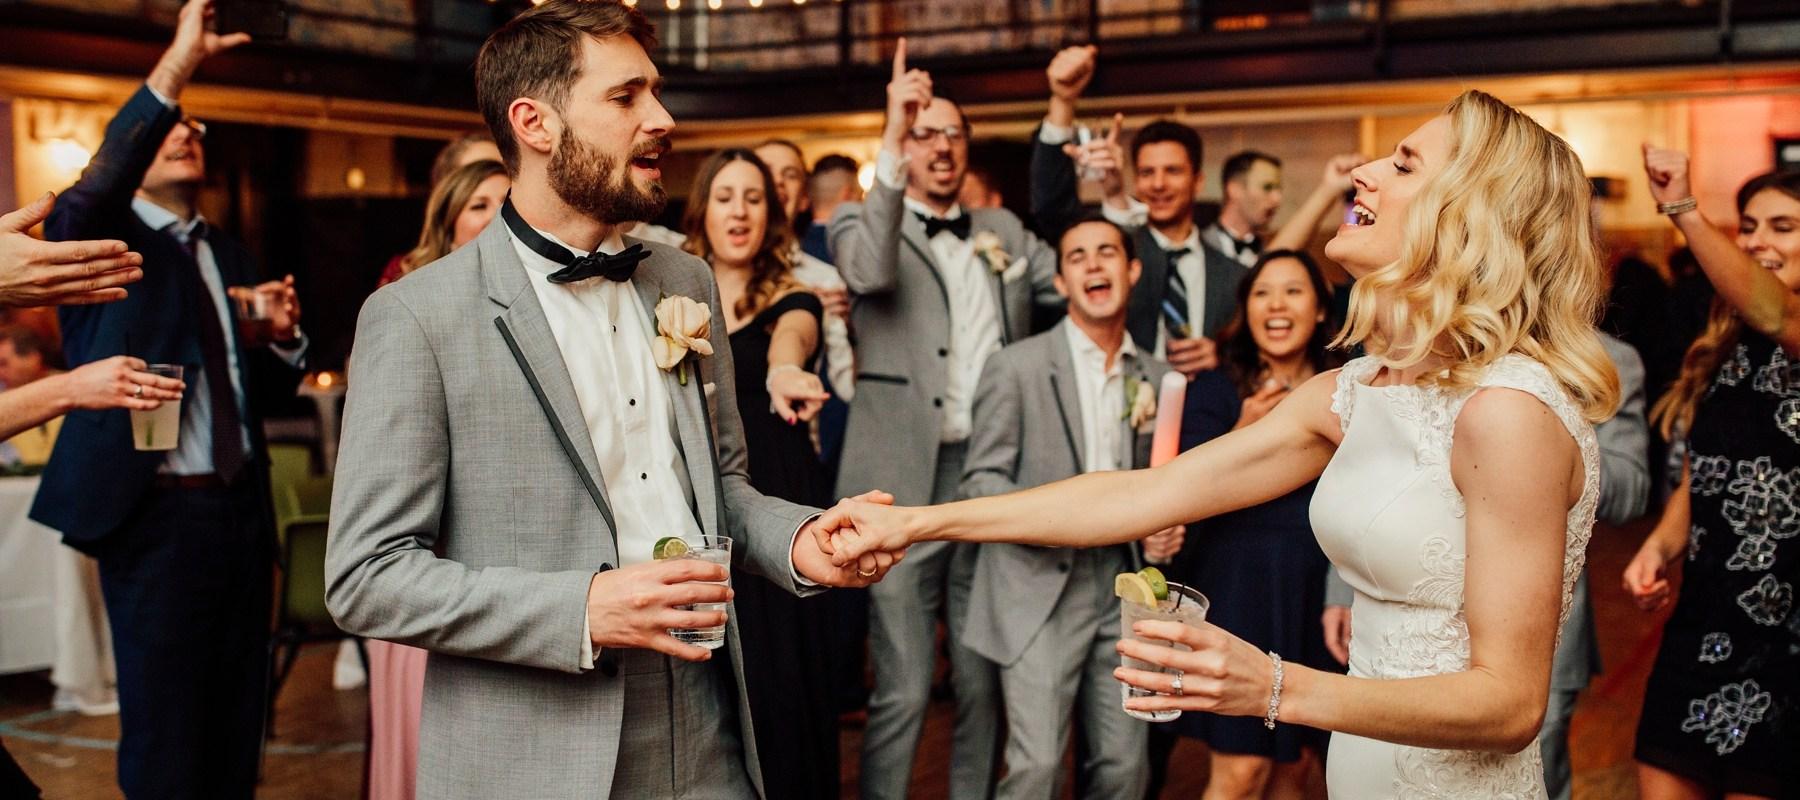 Pittsburgh Wedding Photographer Lifestyle Unique Candid